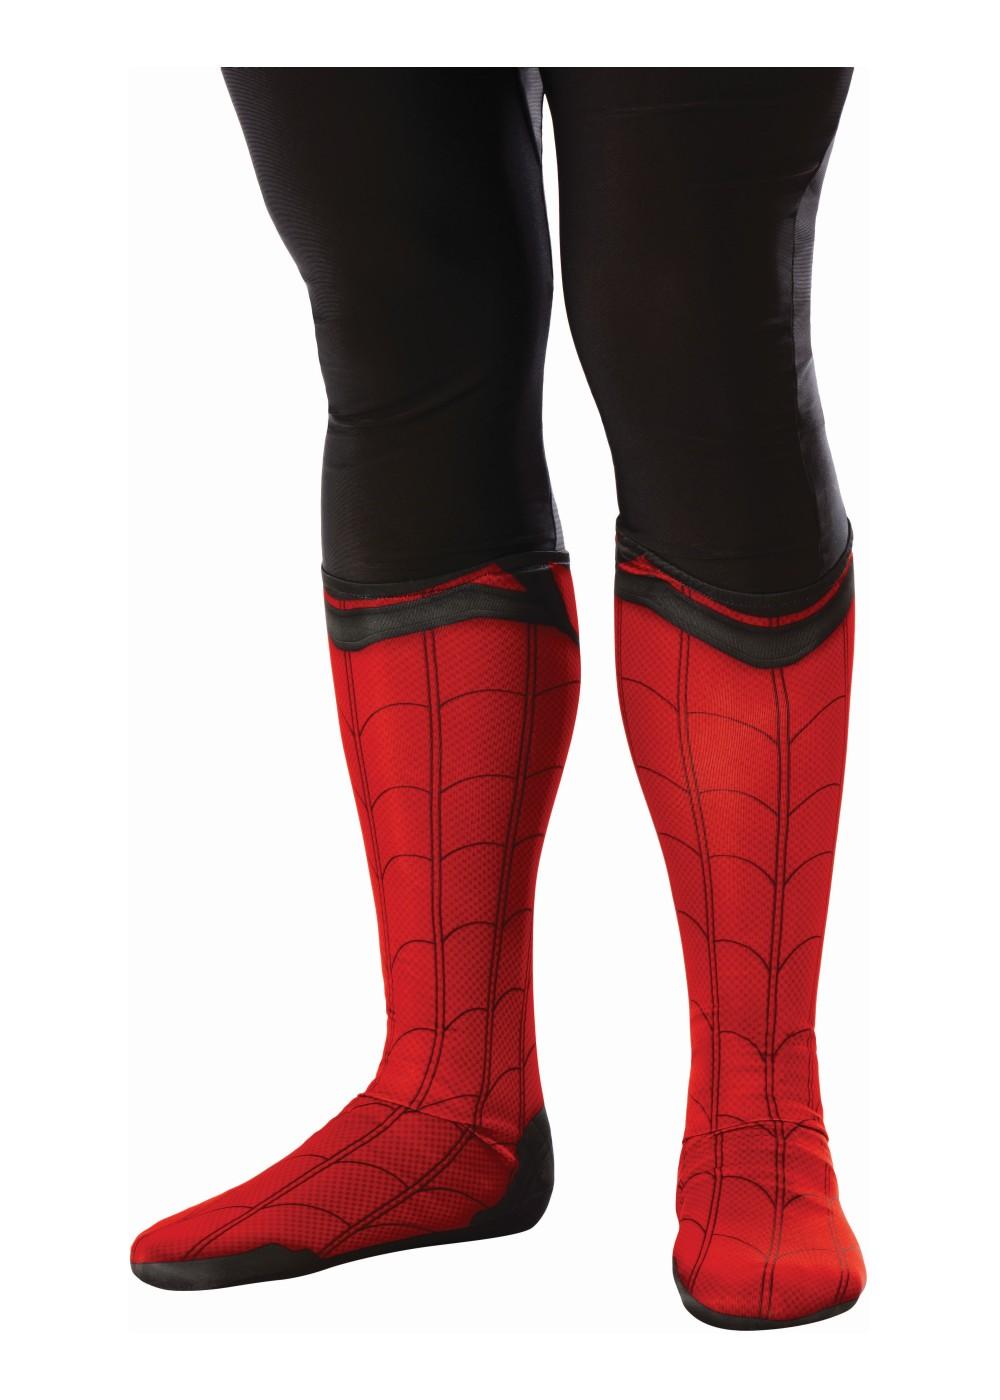 Spiderman Shirts For Men